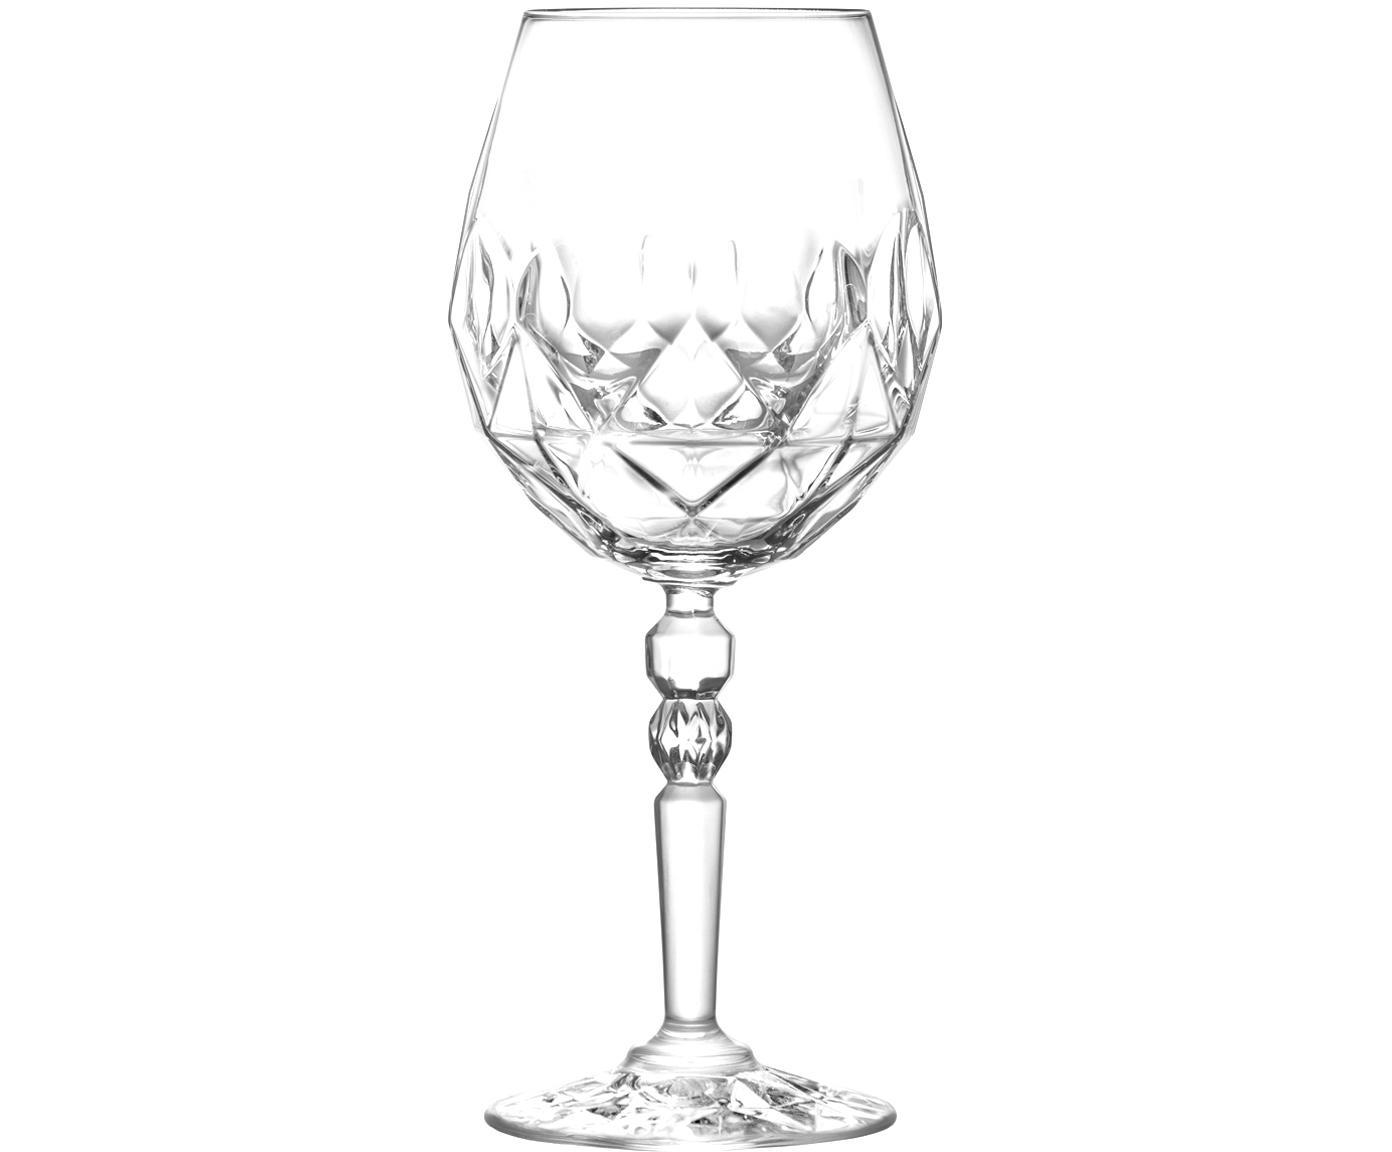 Kristall-Rotweingläser Calicia mit Relief, 6er-Set, Luxion-Kristallglas, Transparent, Ø 10 x H 23 cm